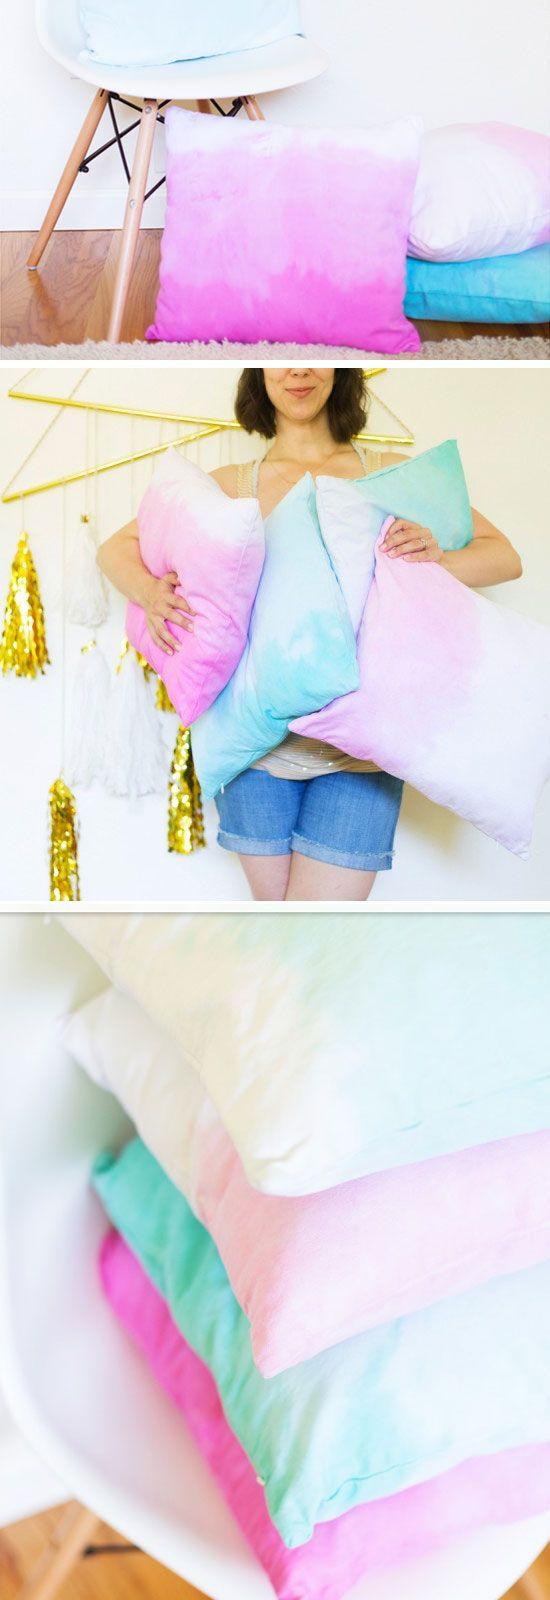 Throw Pillows Dorm Room : Ombre Throw Pillows DIY Dorm Room Ideas for Girls Awesome Ideas For The Home Pinterest ...